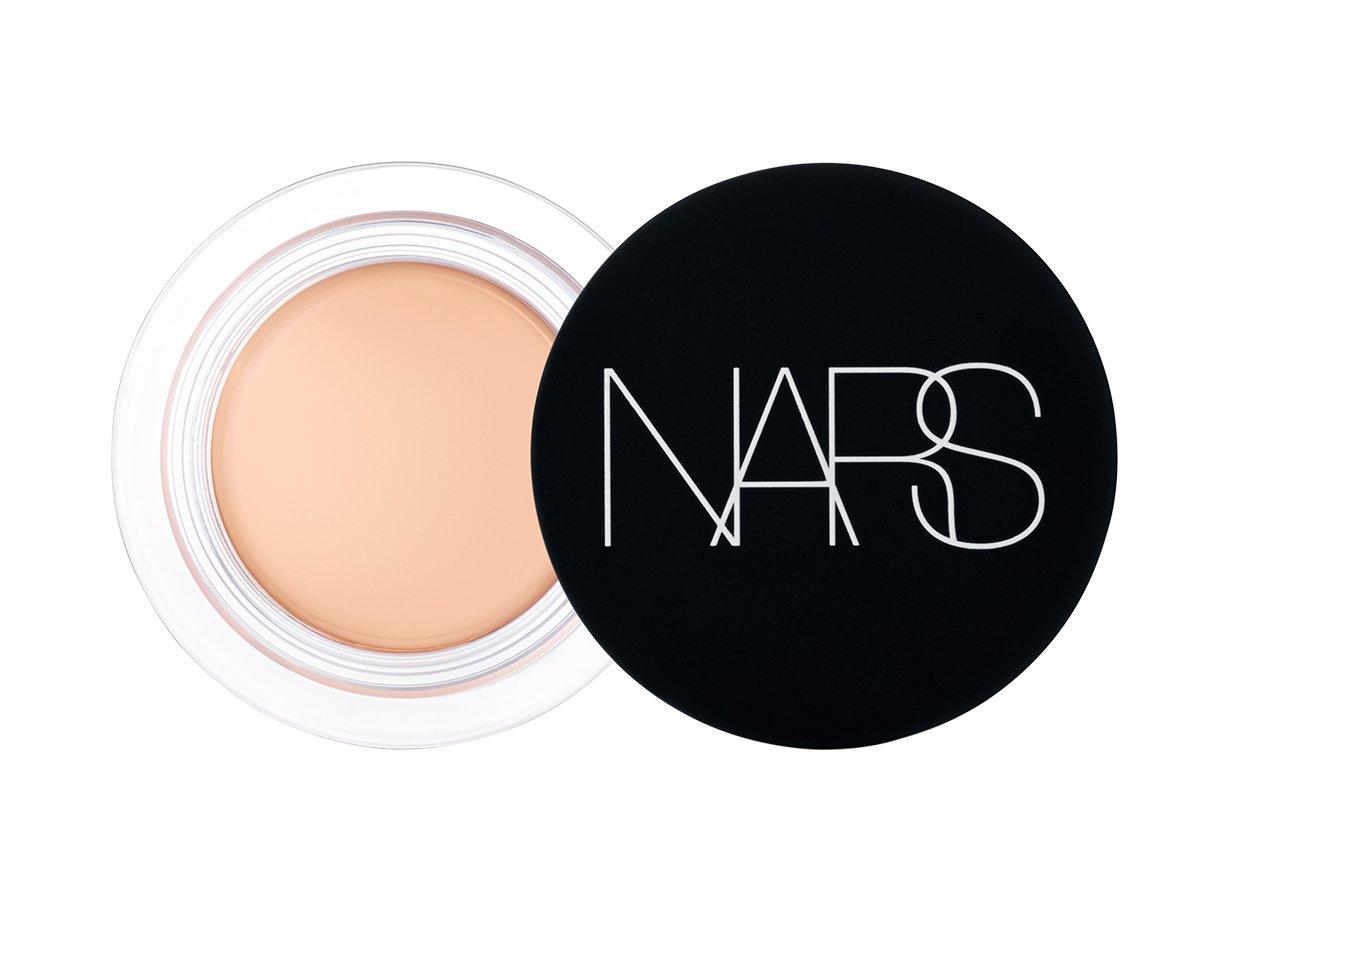 Nars Releases Soft Matte Complete Concealer in 16 Shades